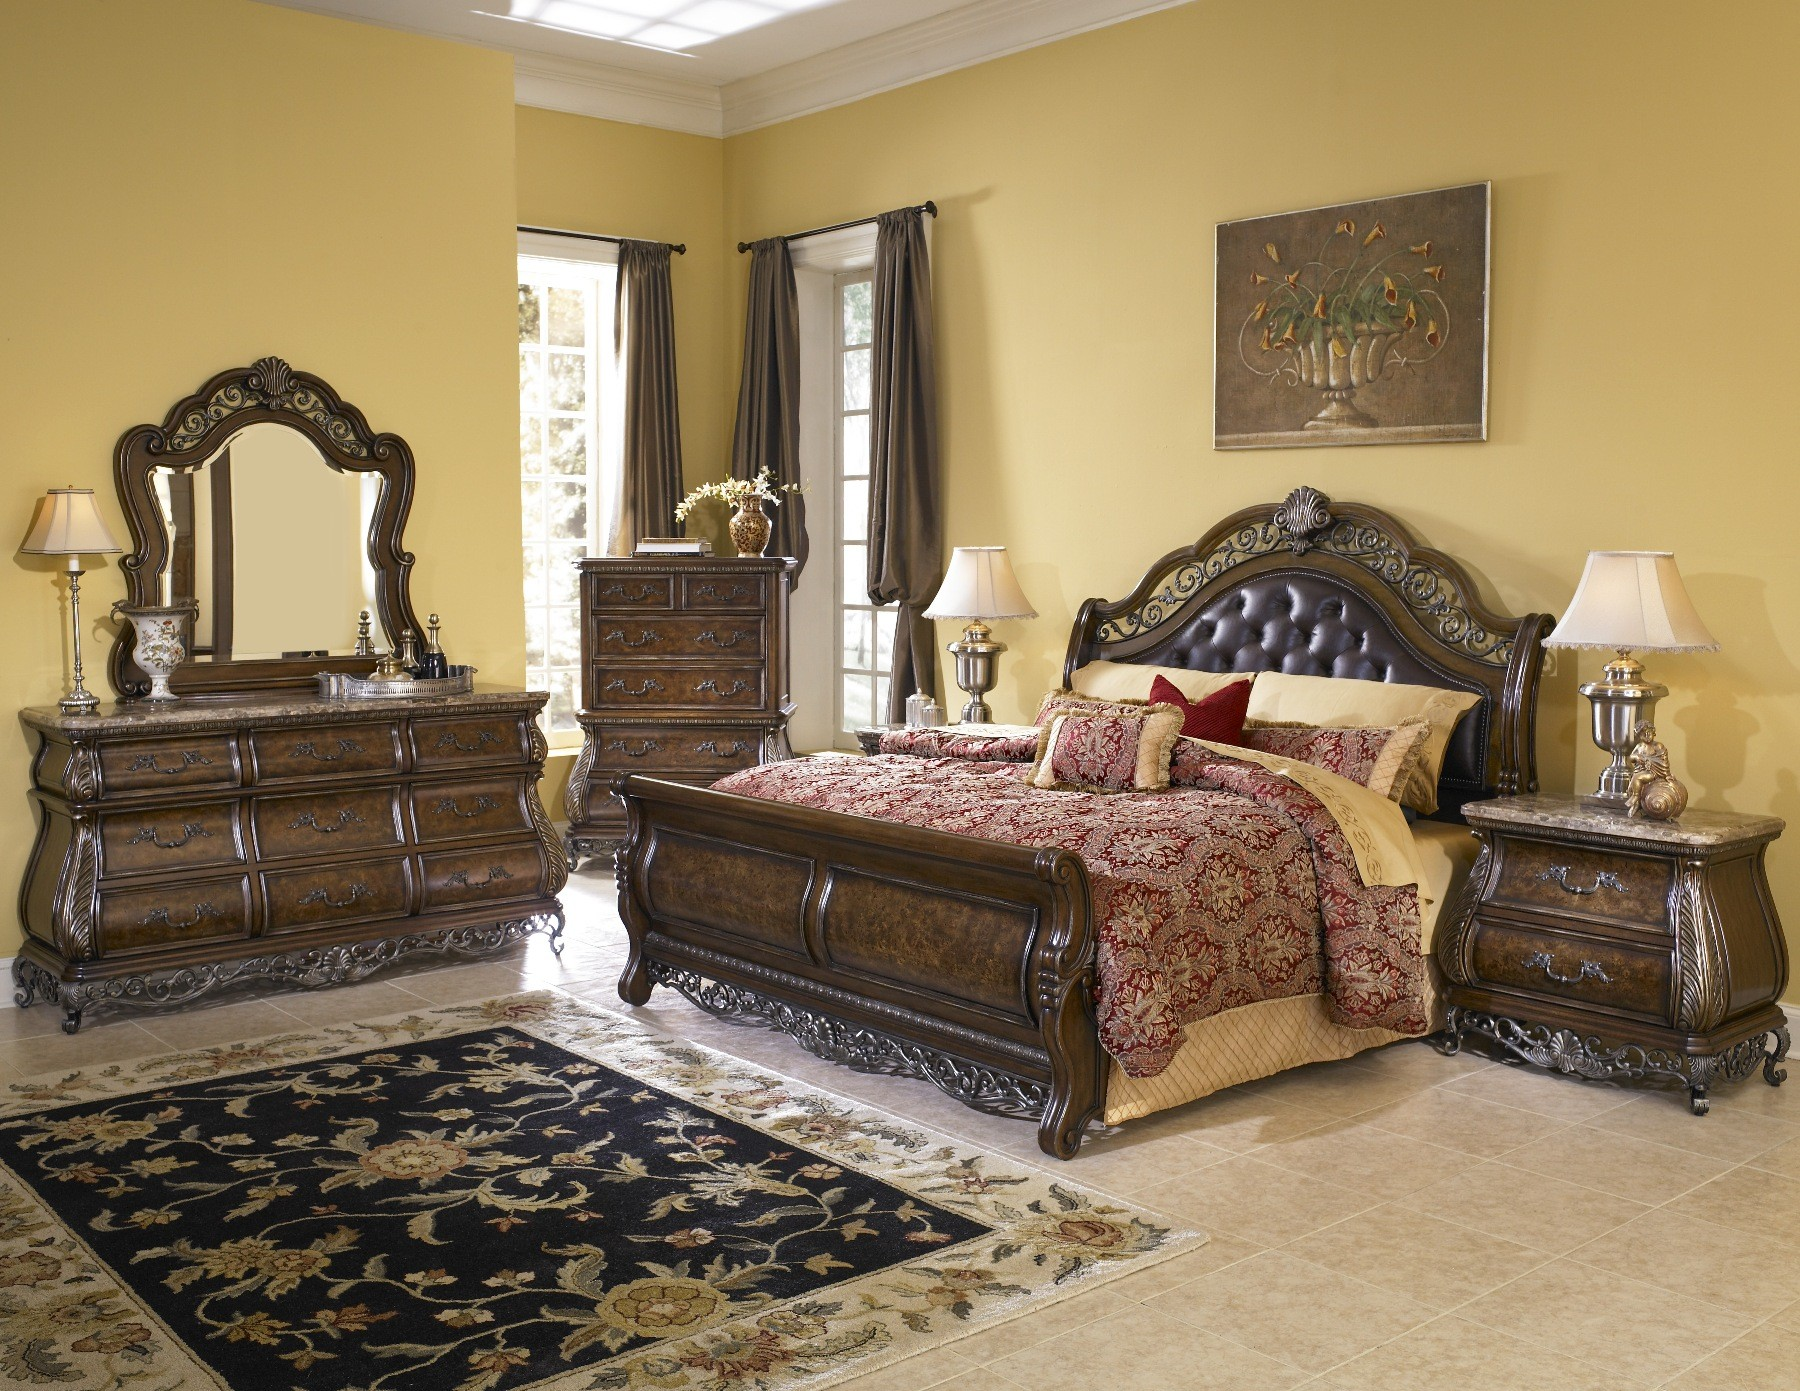 Birkhaven King Size Bed from Pulaski